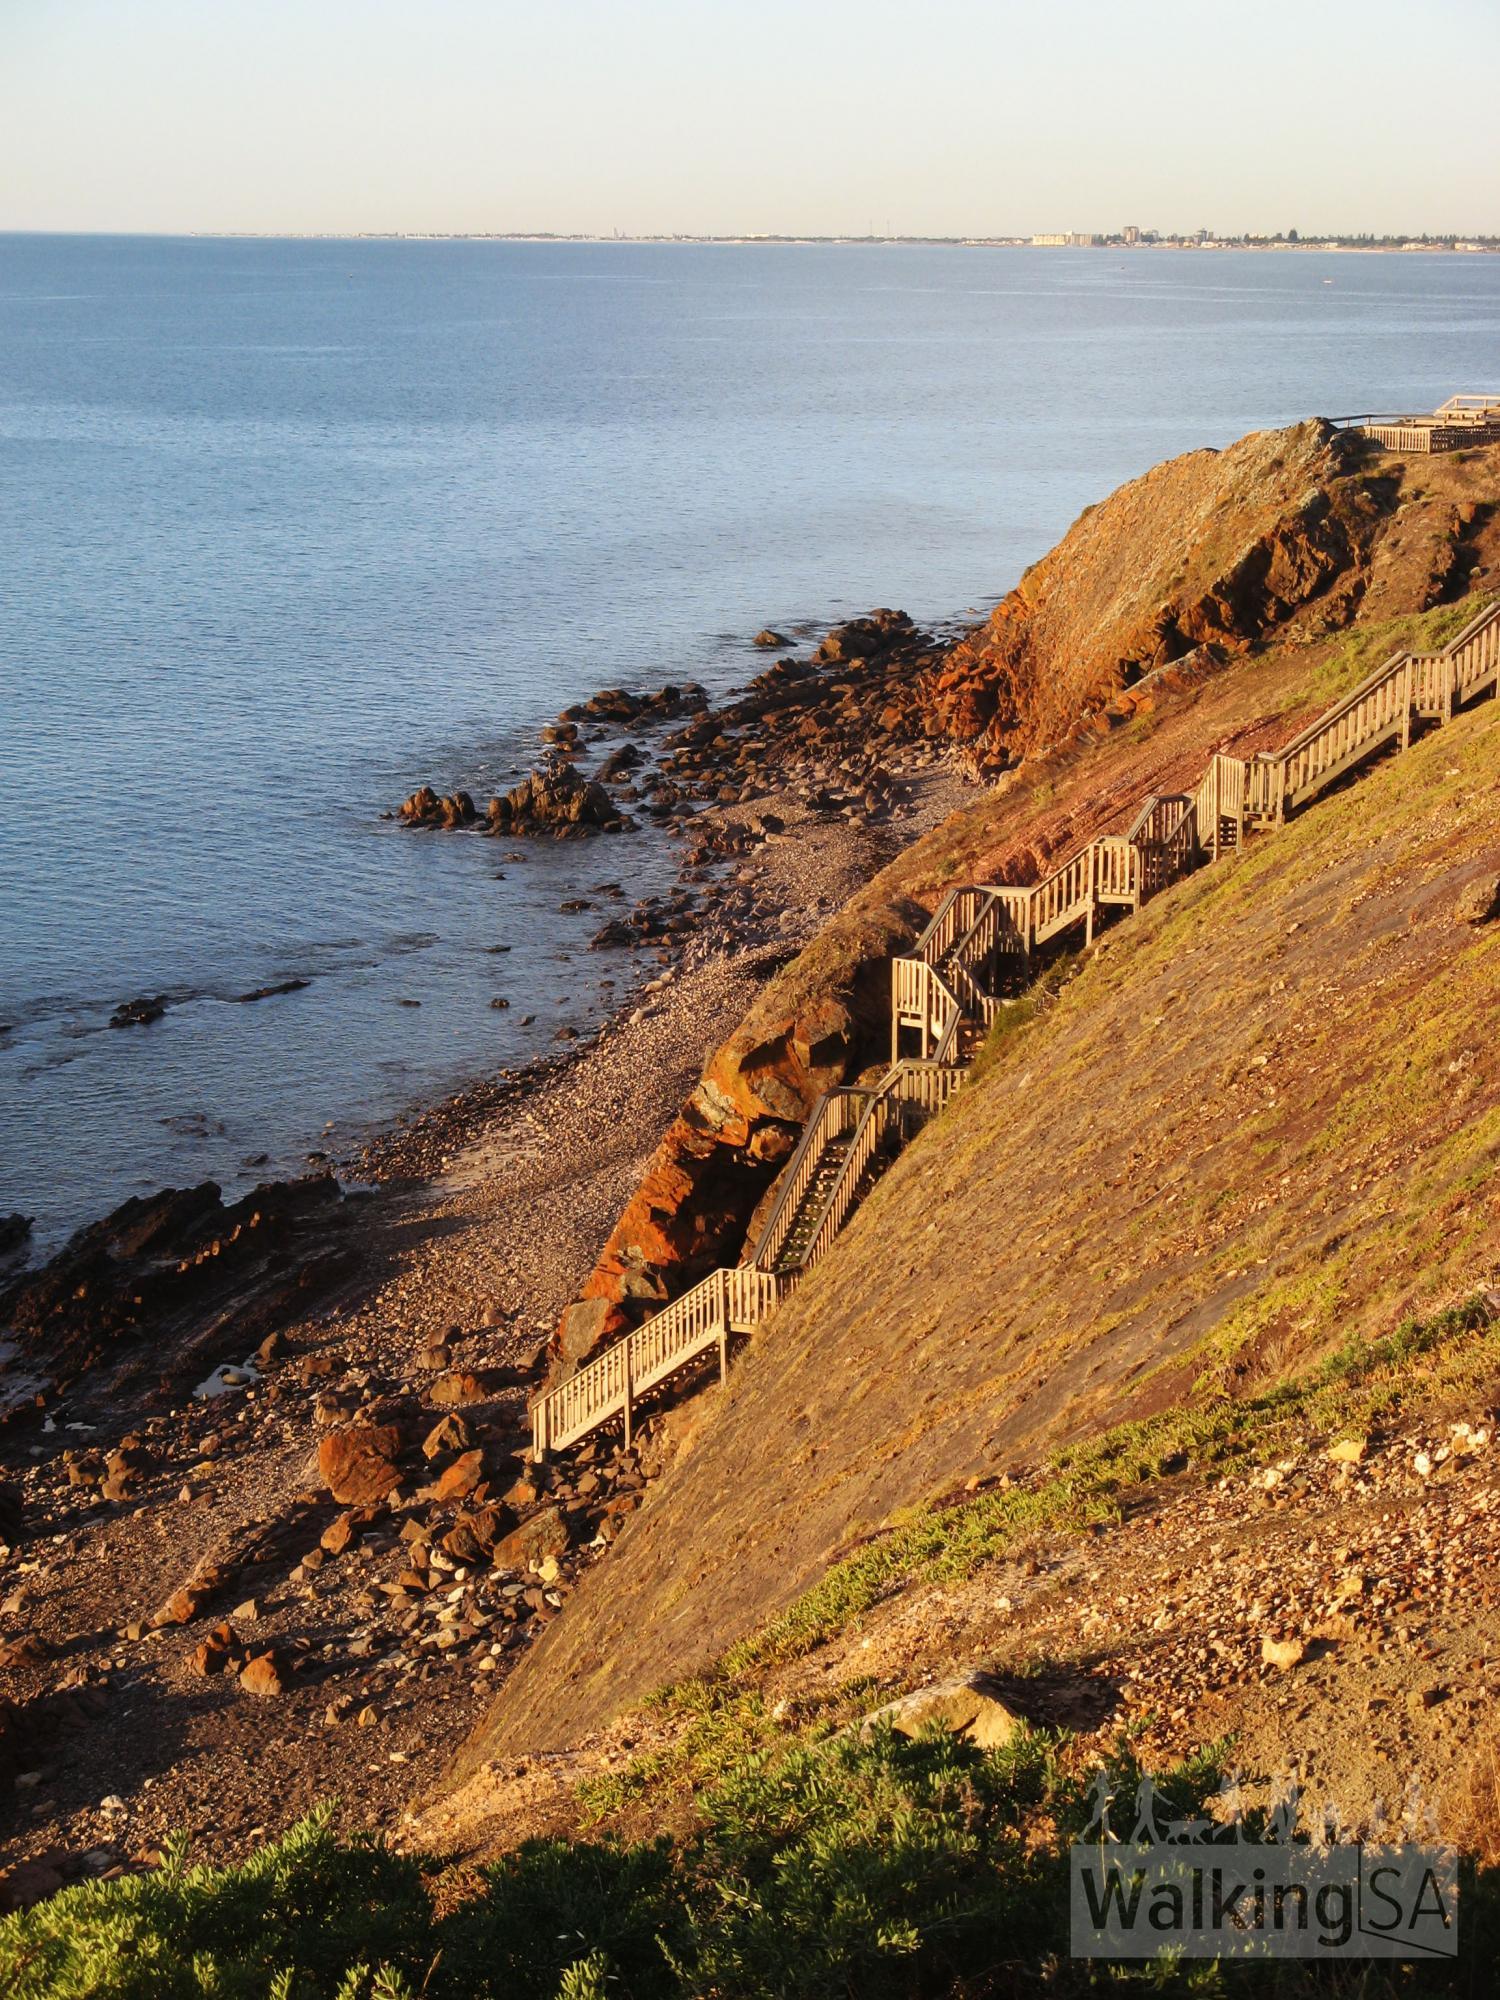 hallett cove boardwalk marion coastal walking trail. Black Bedroom Furniture Sets. Home Design Ideas